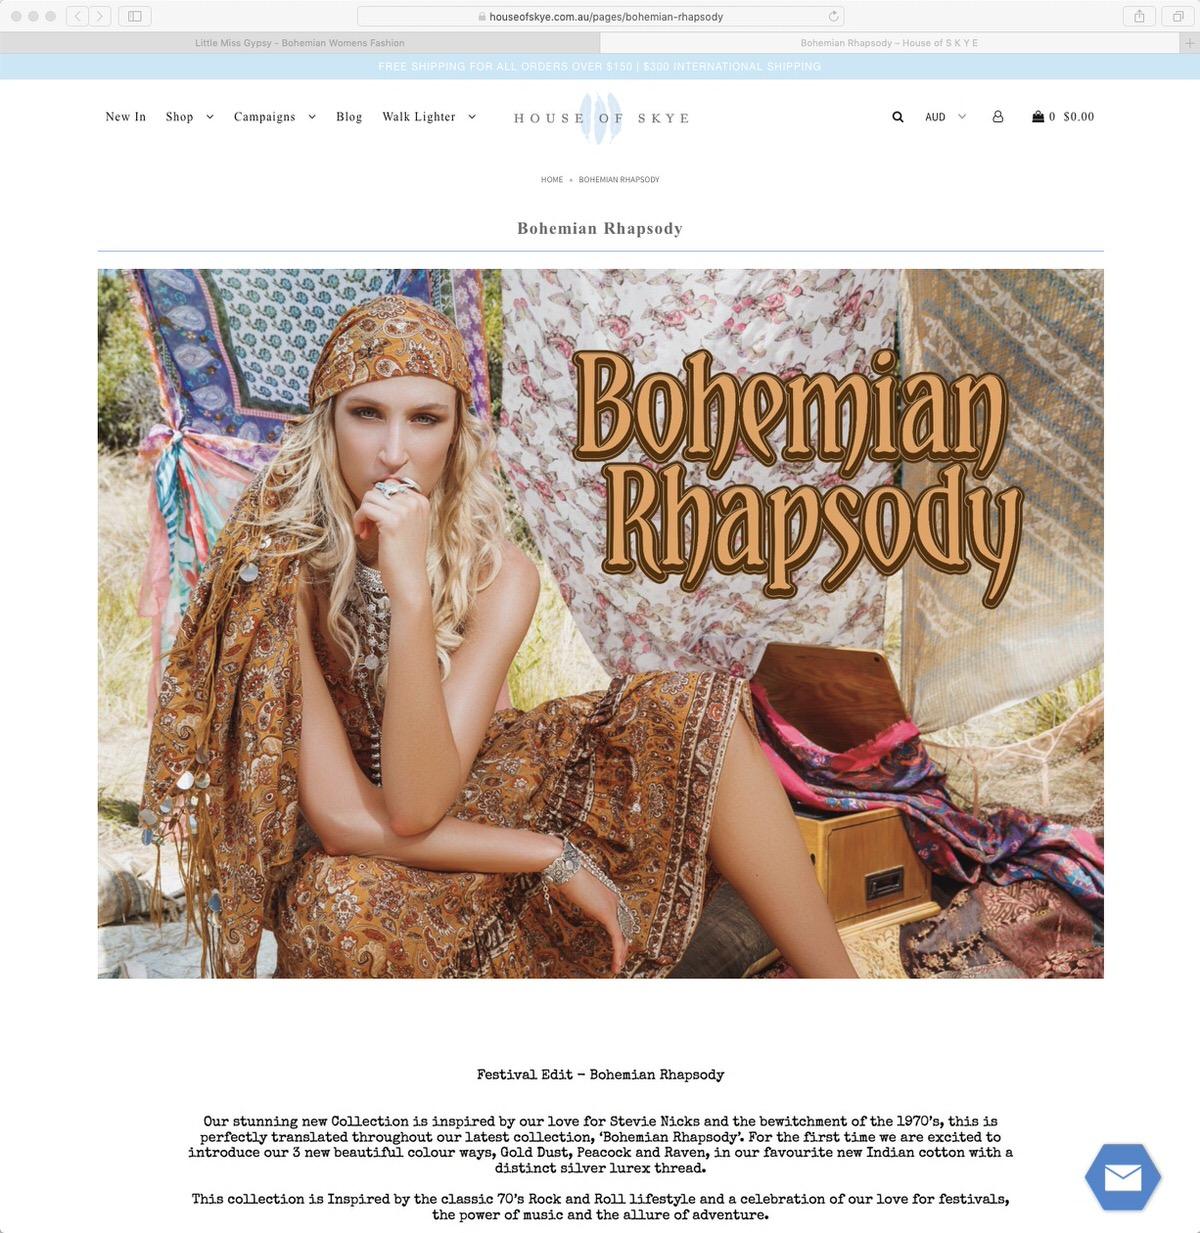 Ryan_Ammon_Creative-Fashion_Photography-House_of_Skye-Grady_Wulff-Bohemian_Rhapsody-01.jpg